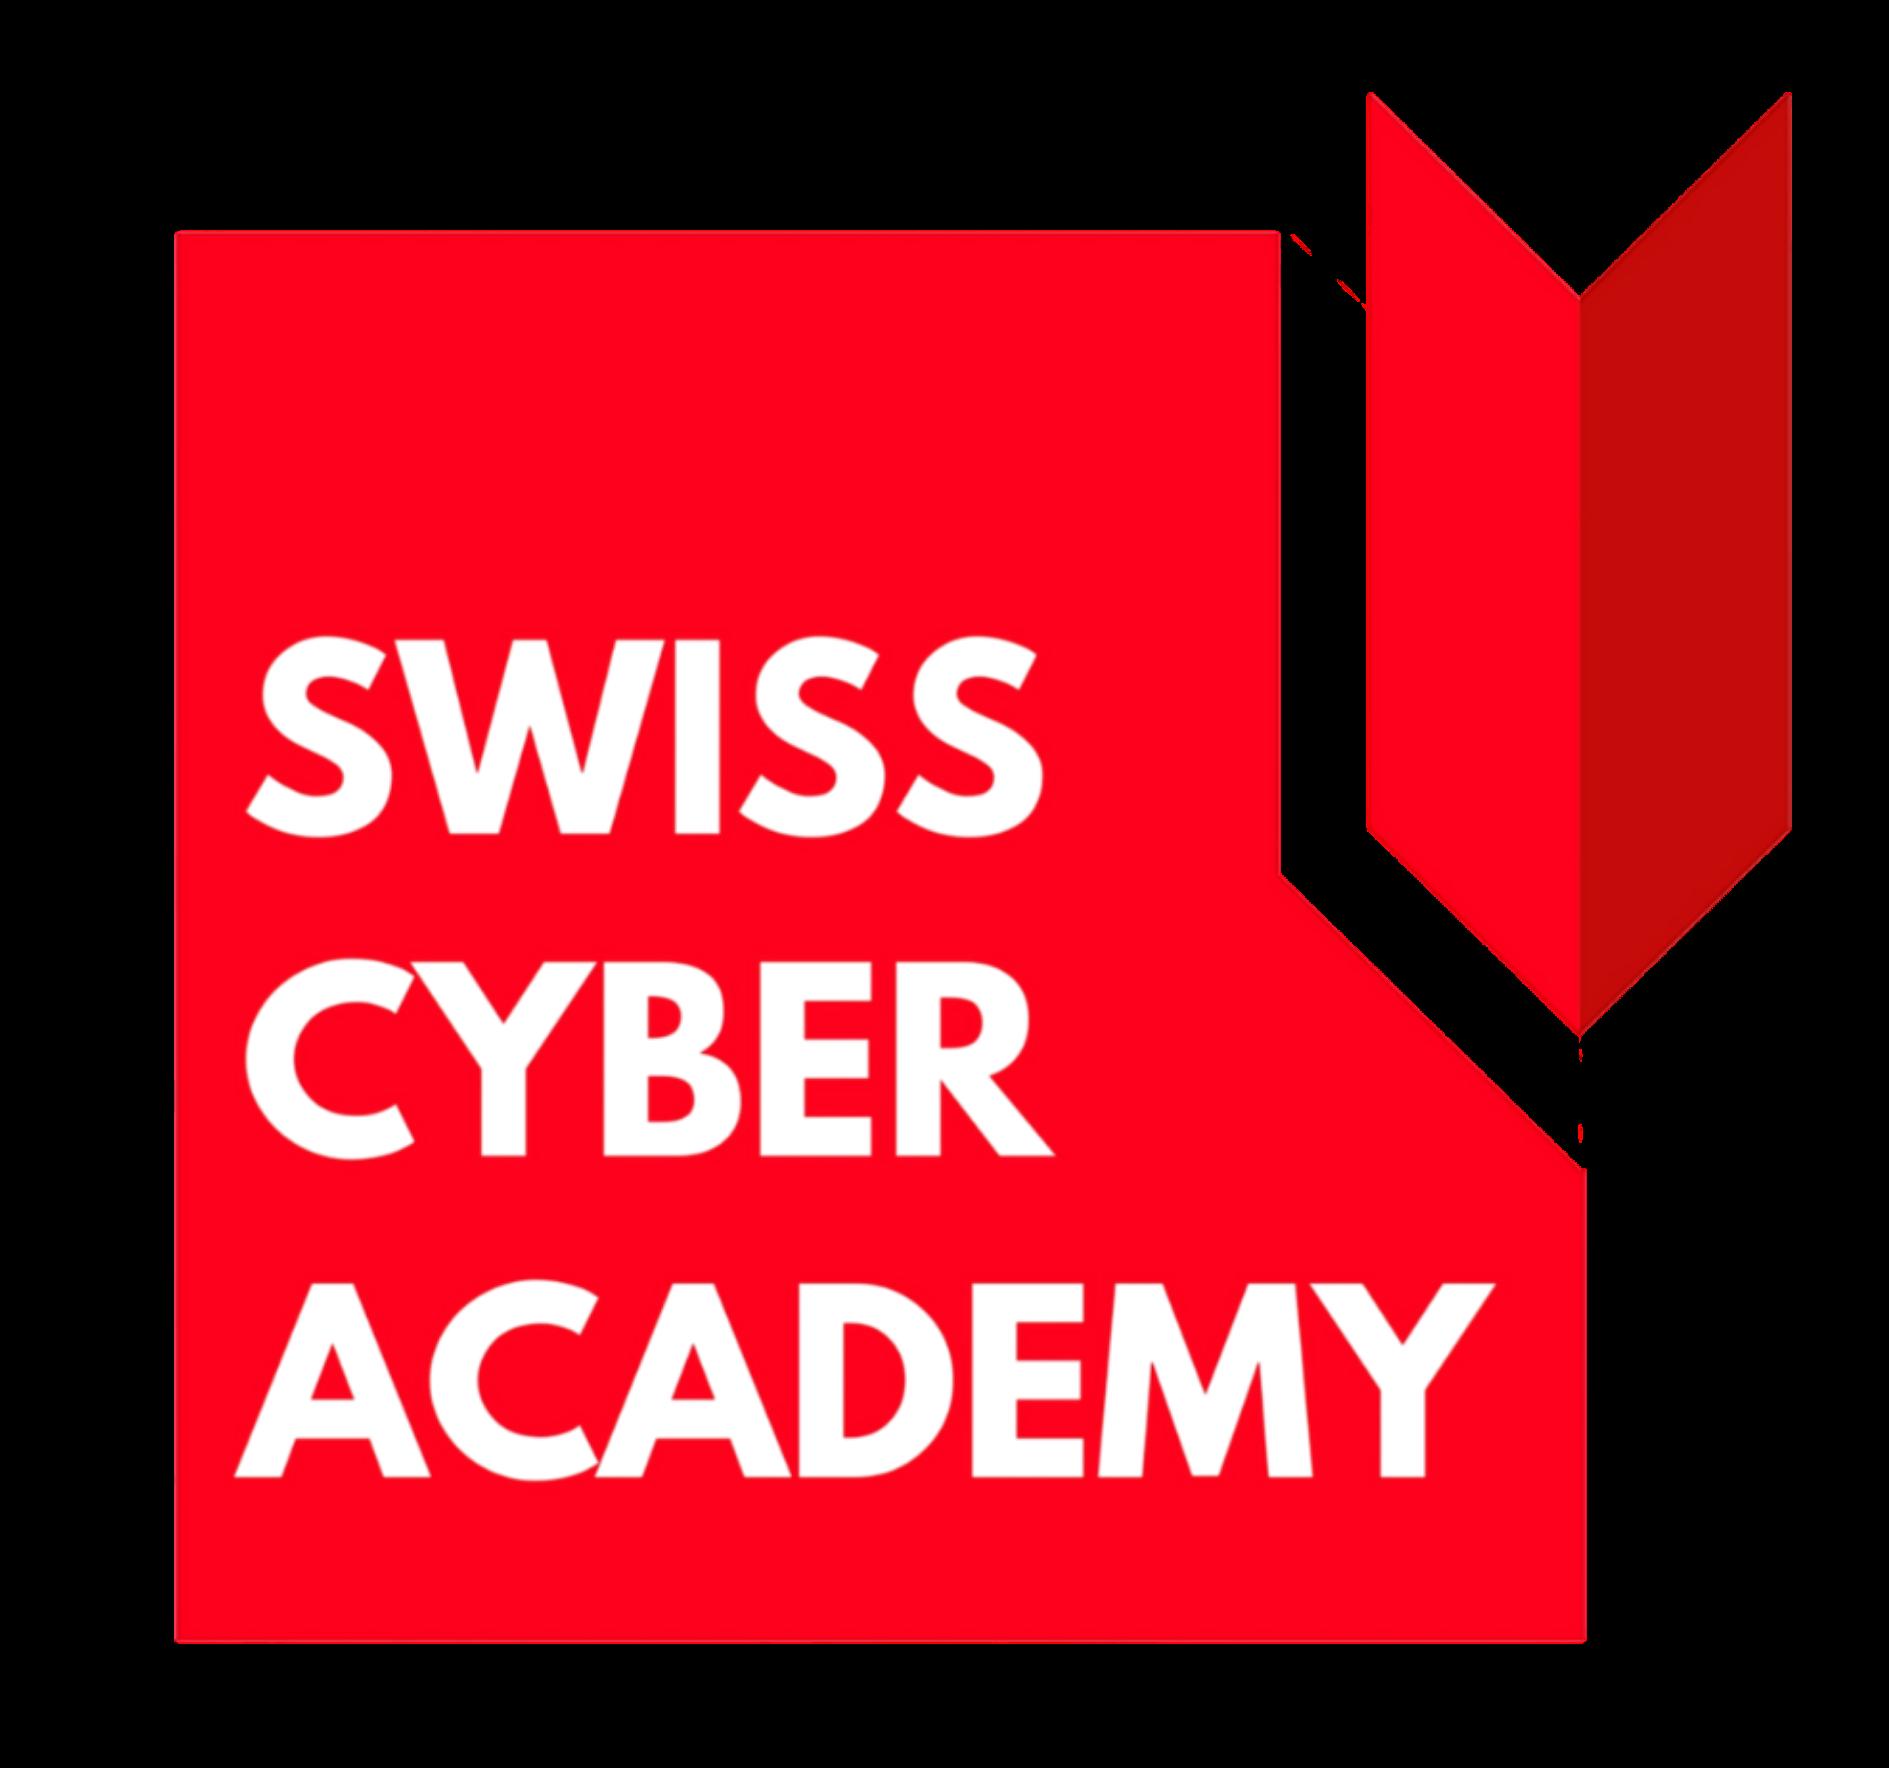 Swiss Cyber Academy